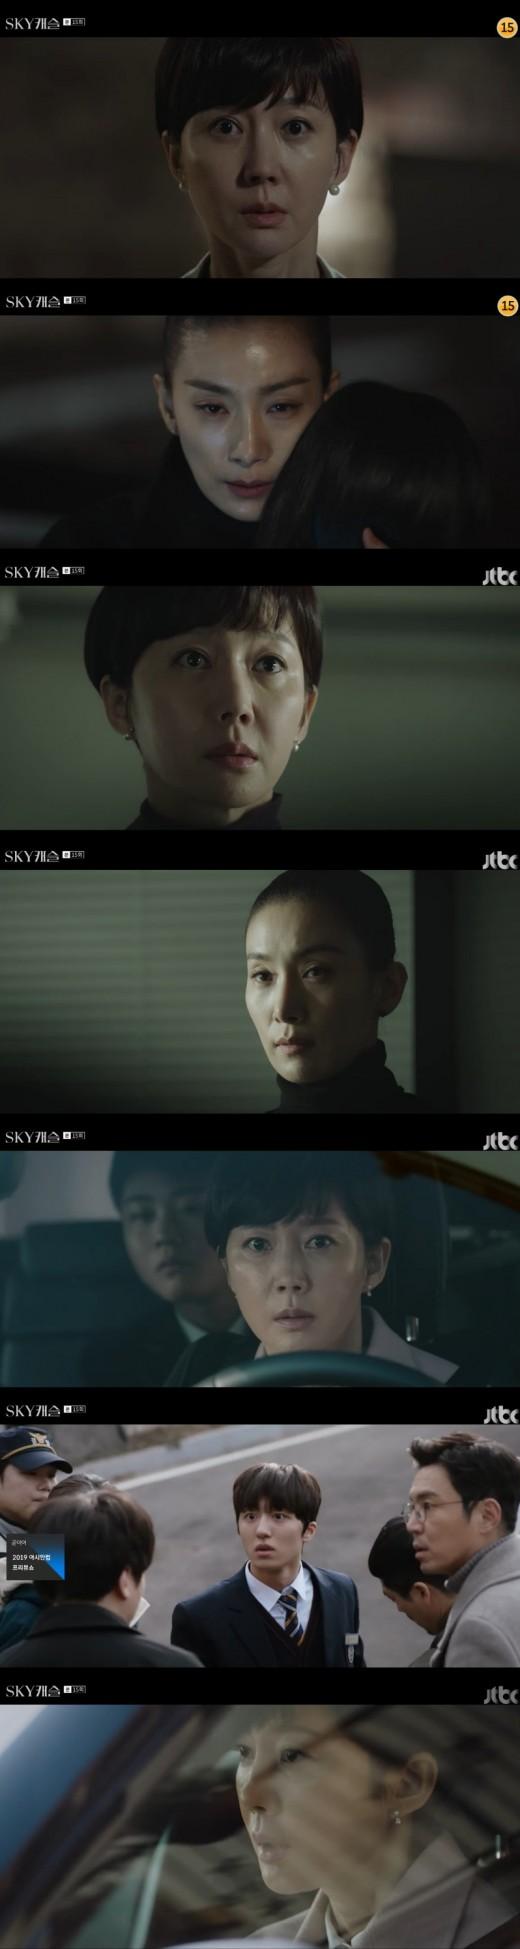 'SKY 캐슬' 찬희, 김보라 살해혐의로 체포... 김서형 계획대로_이미지